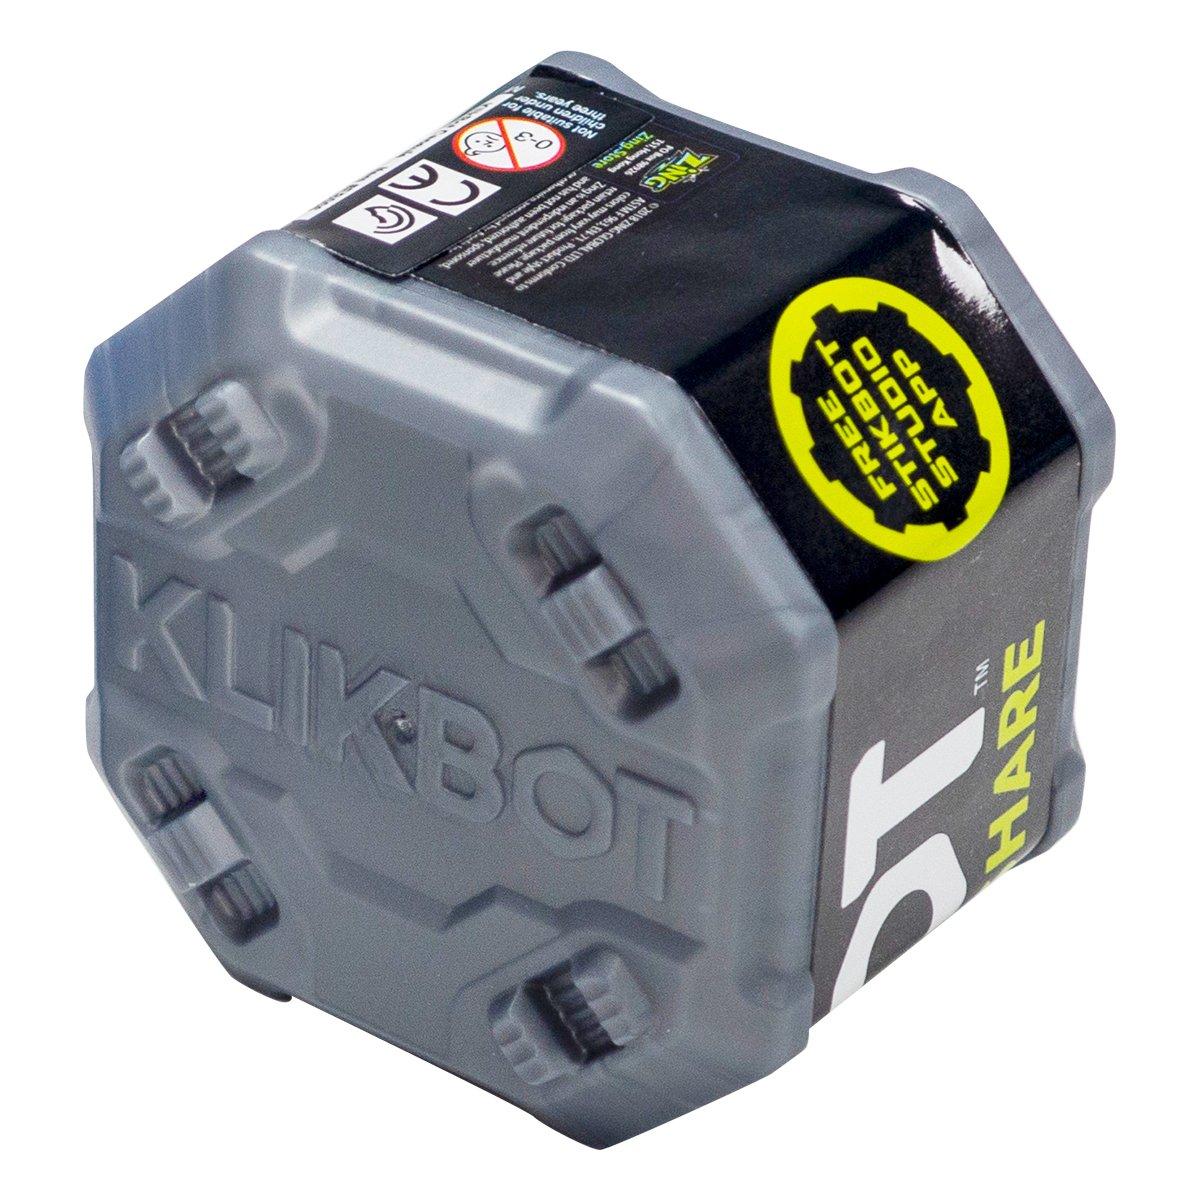 Figurina Surpriza robot articulat transformabil in capsula Klikbot, Grey